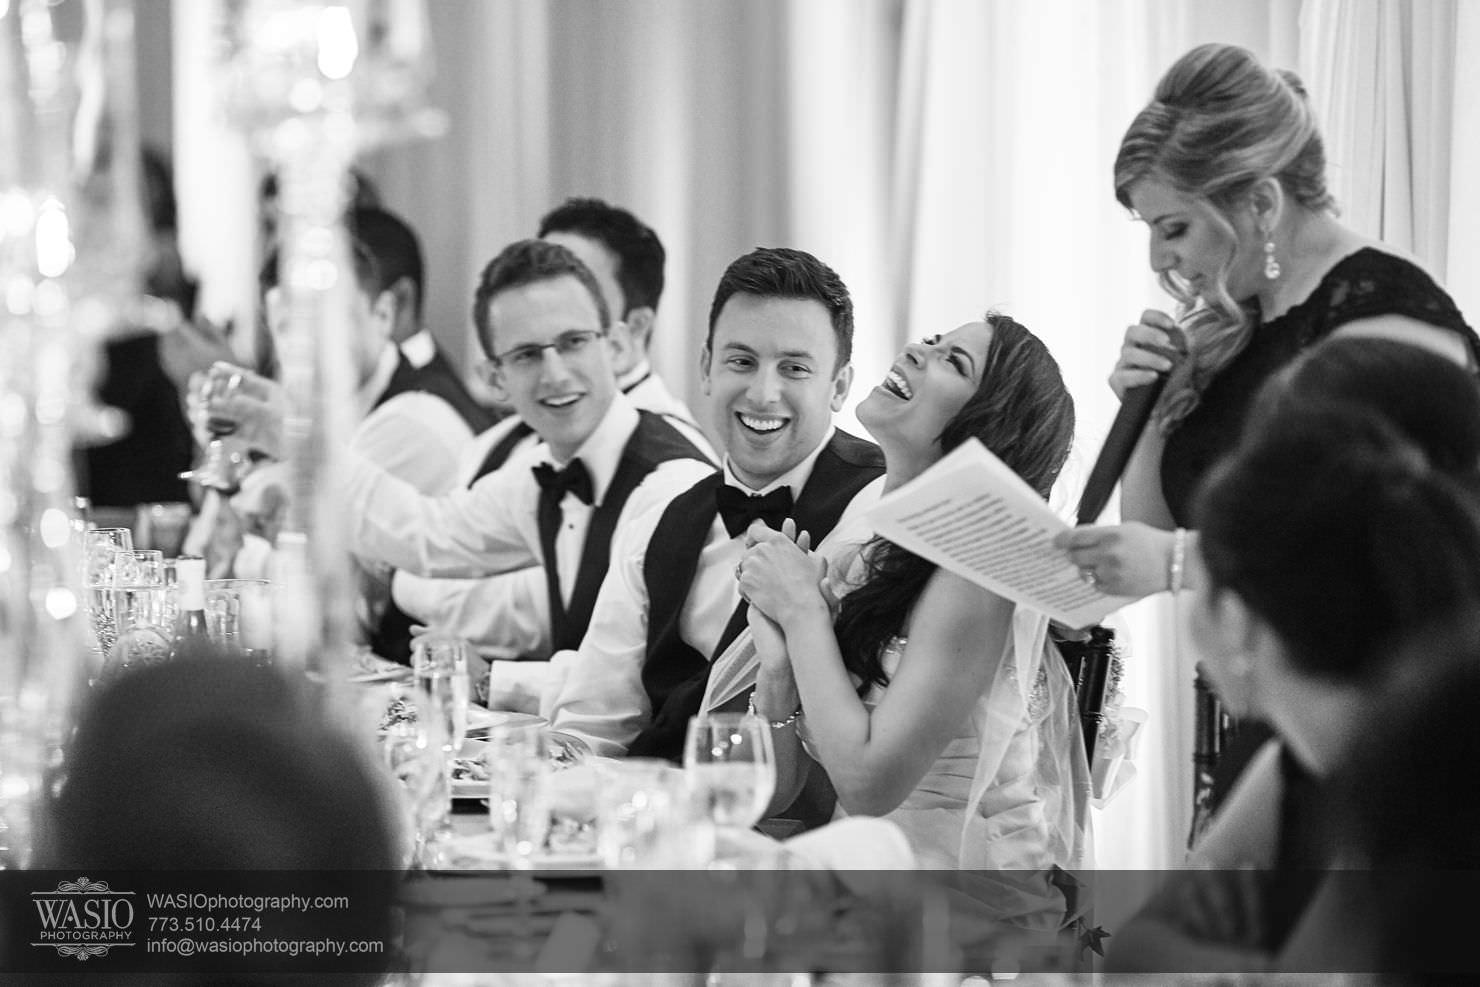 046_Chicago-Spring-Wedding_Chrissy-Andrew_3P4C6588-copy Chicago Spring Wedding - Chrissy + Andrew